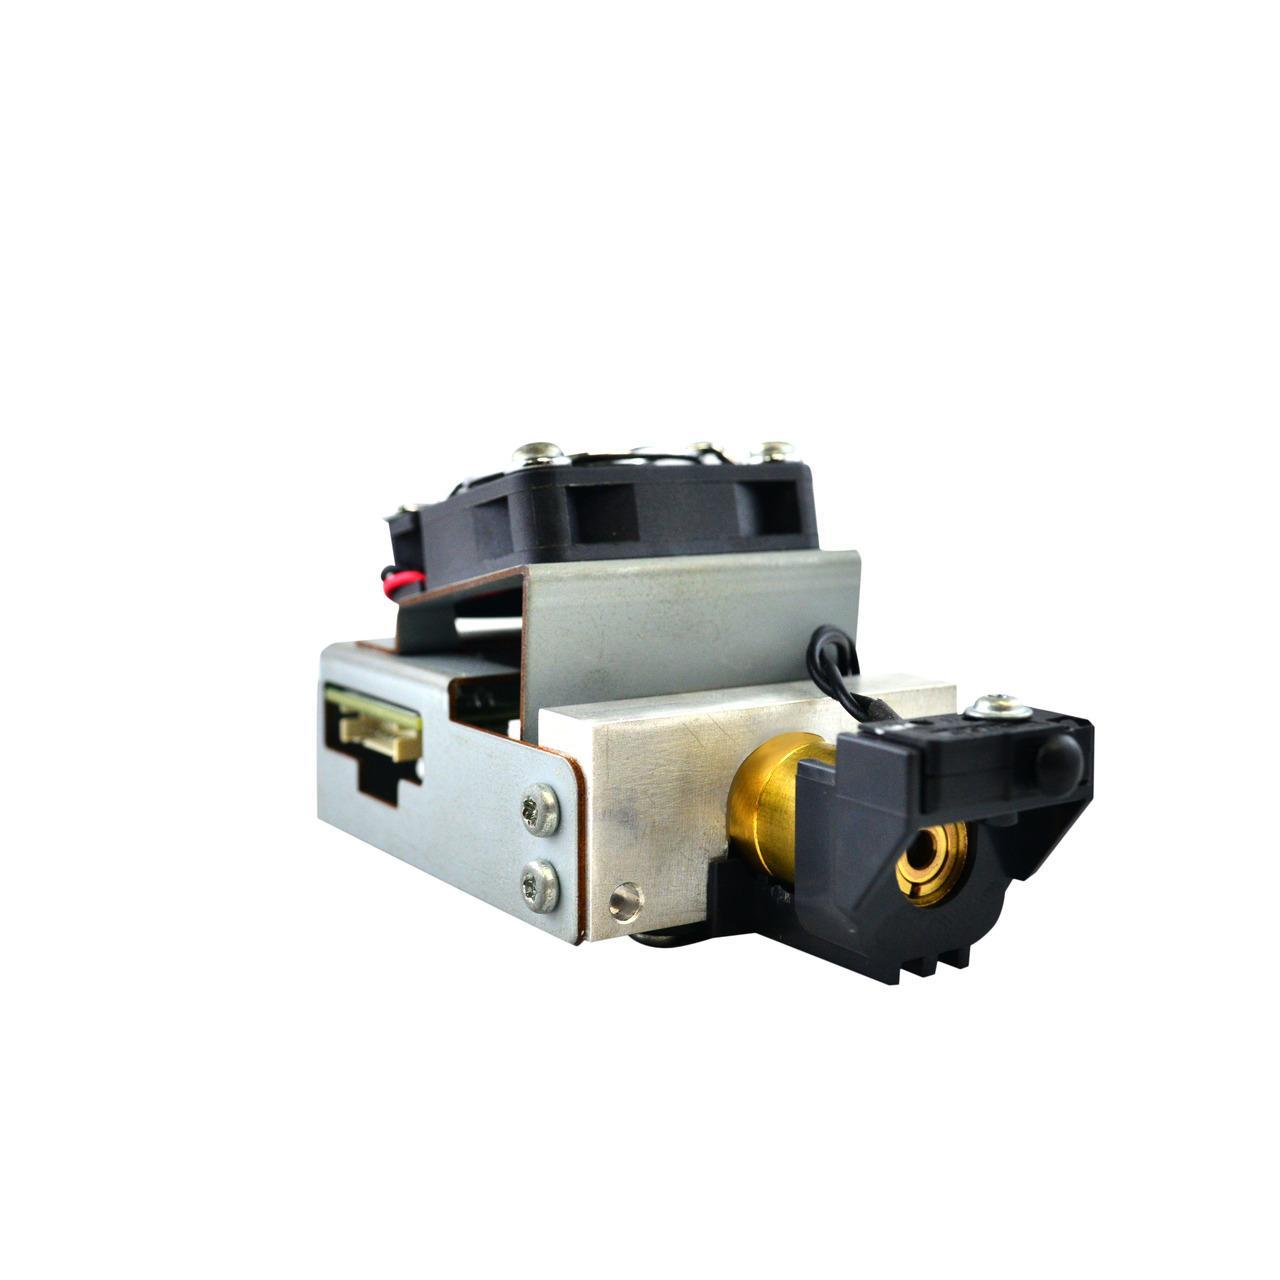 XYZprinting Laser-Gravurmodul für 3D-Drucker da Vinci Jr. Pro X+